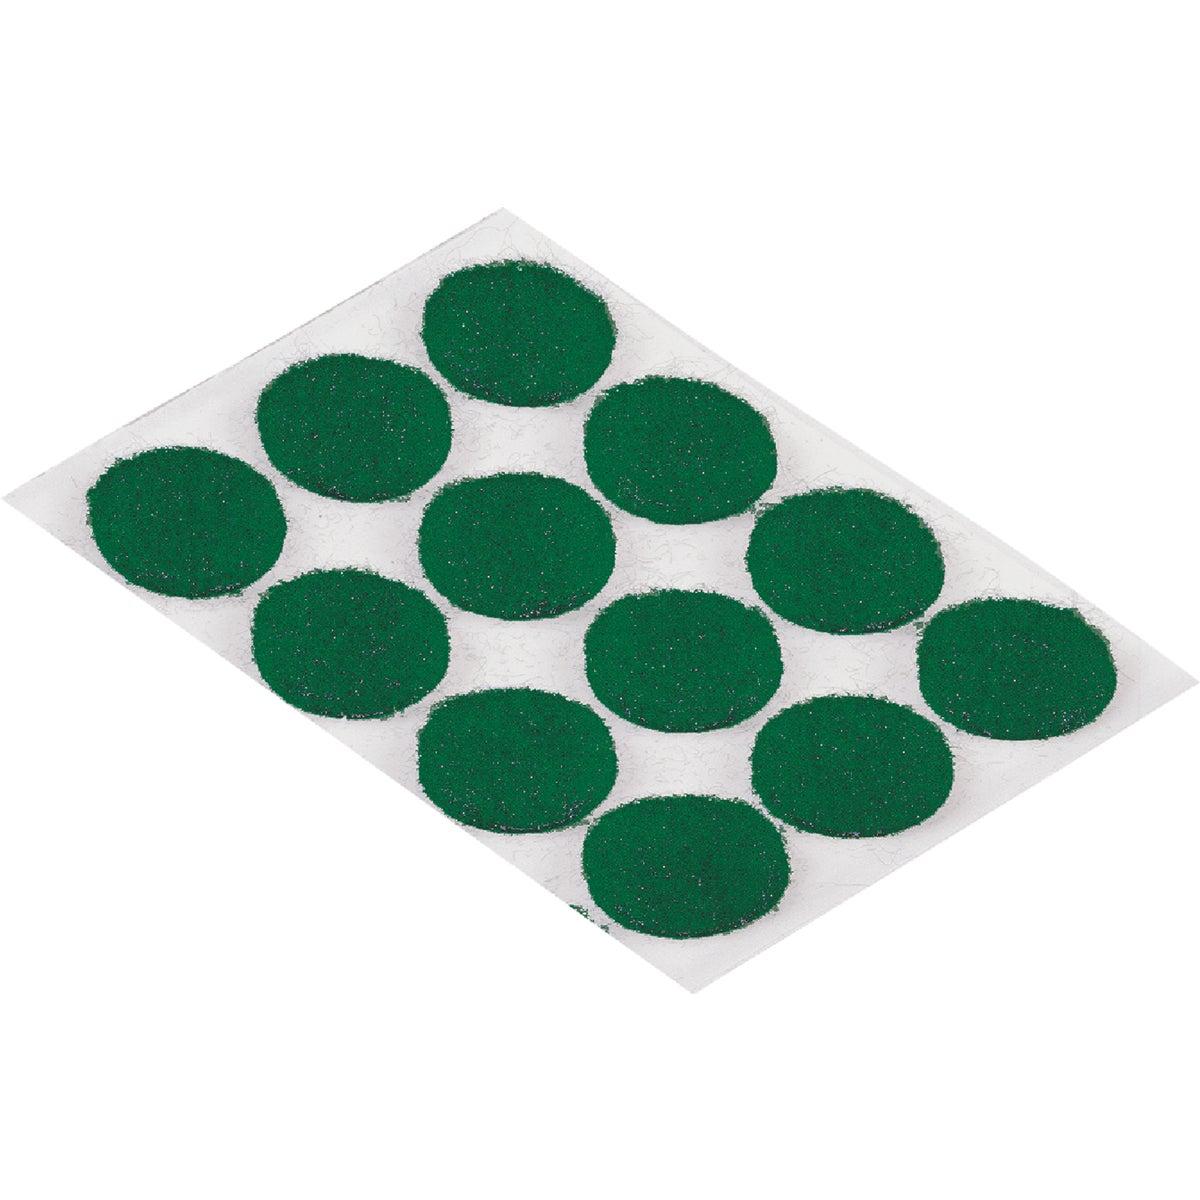 "3/8"" GREEN FELT PAD"